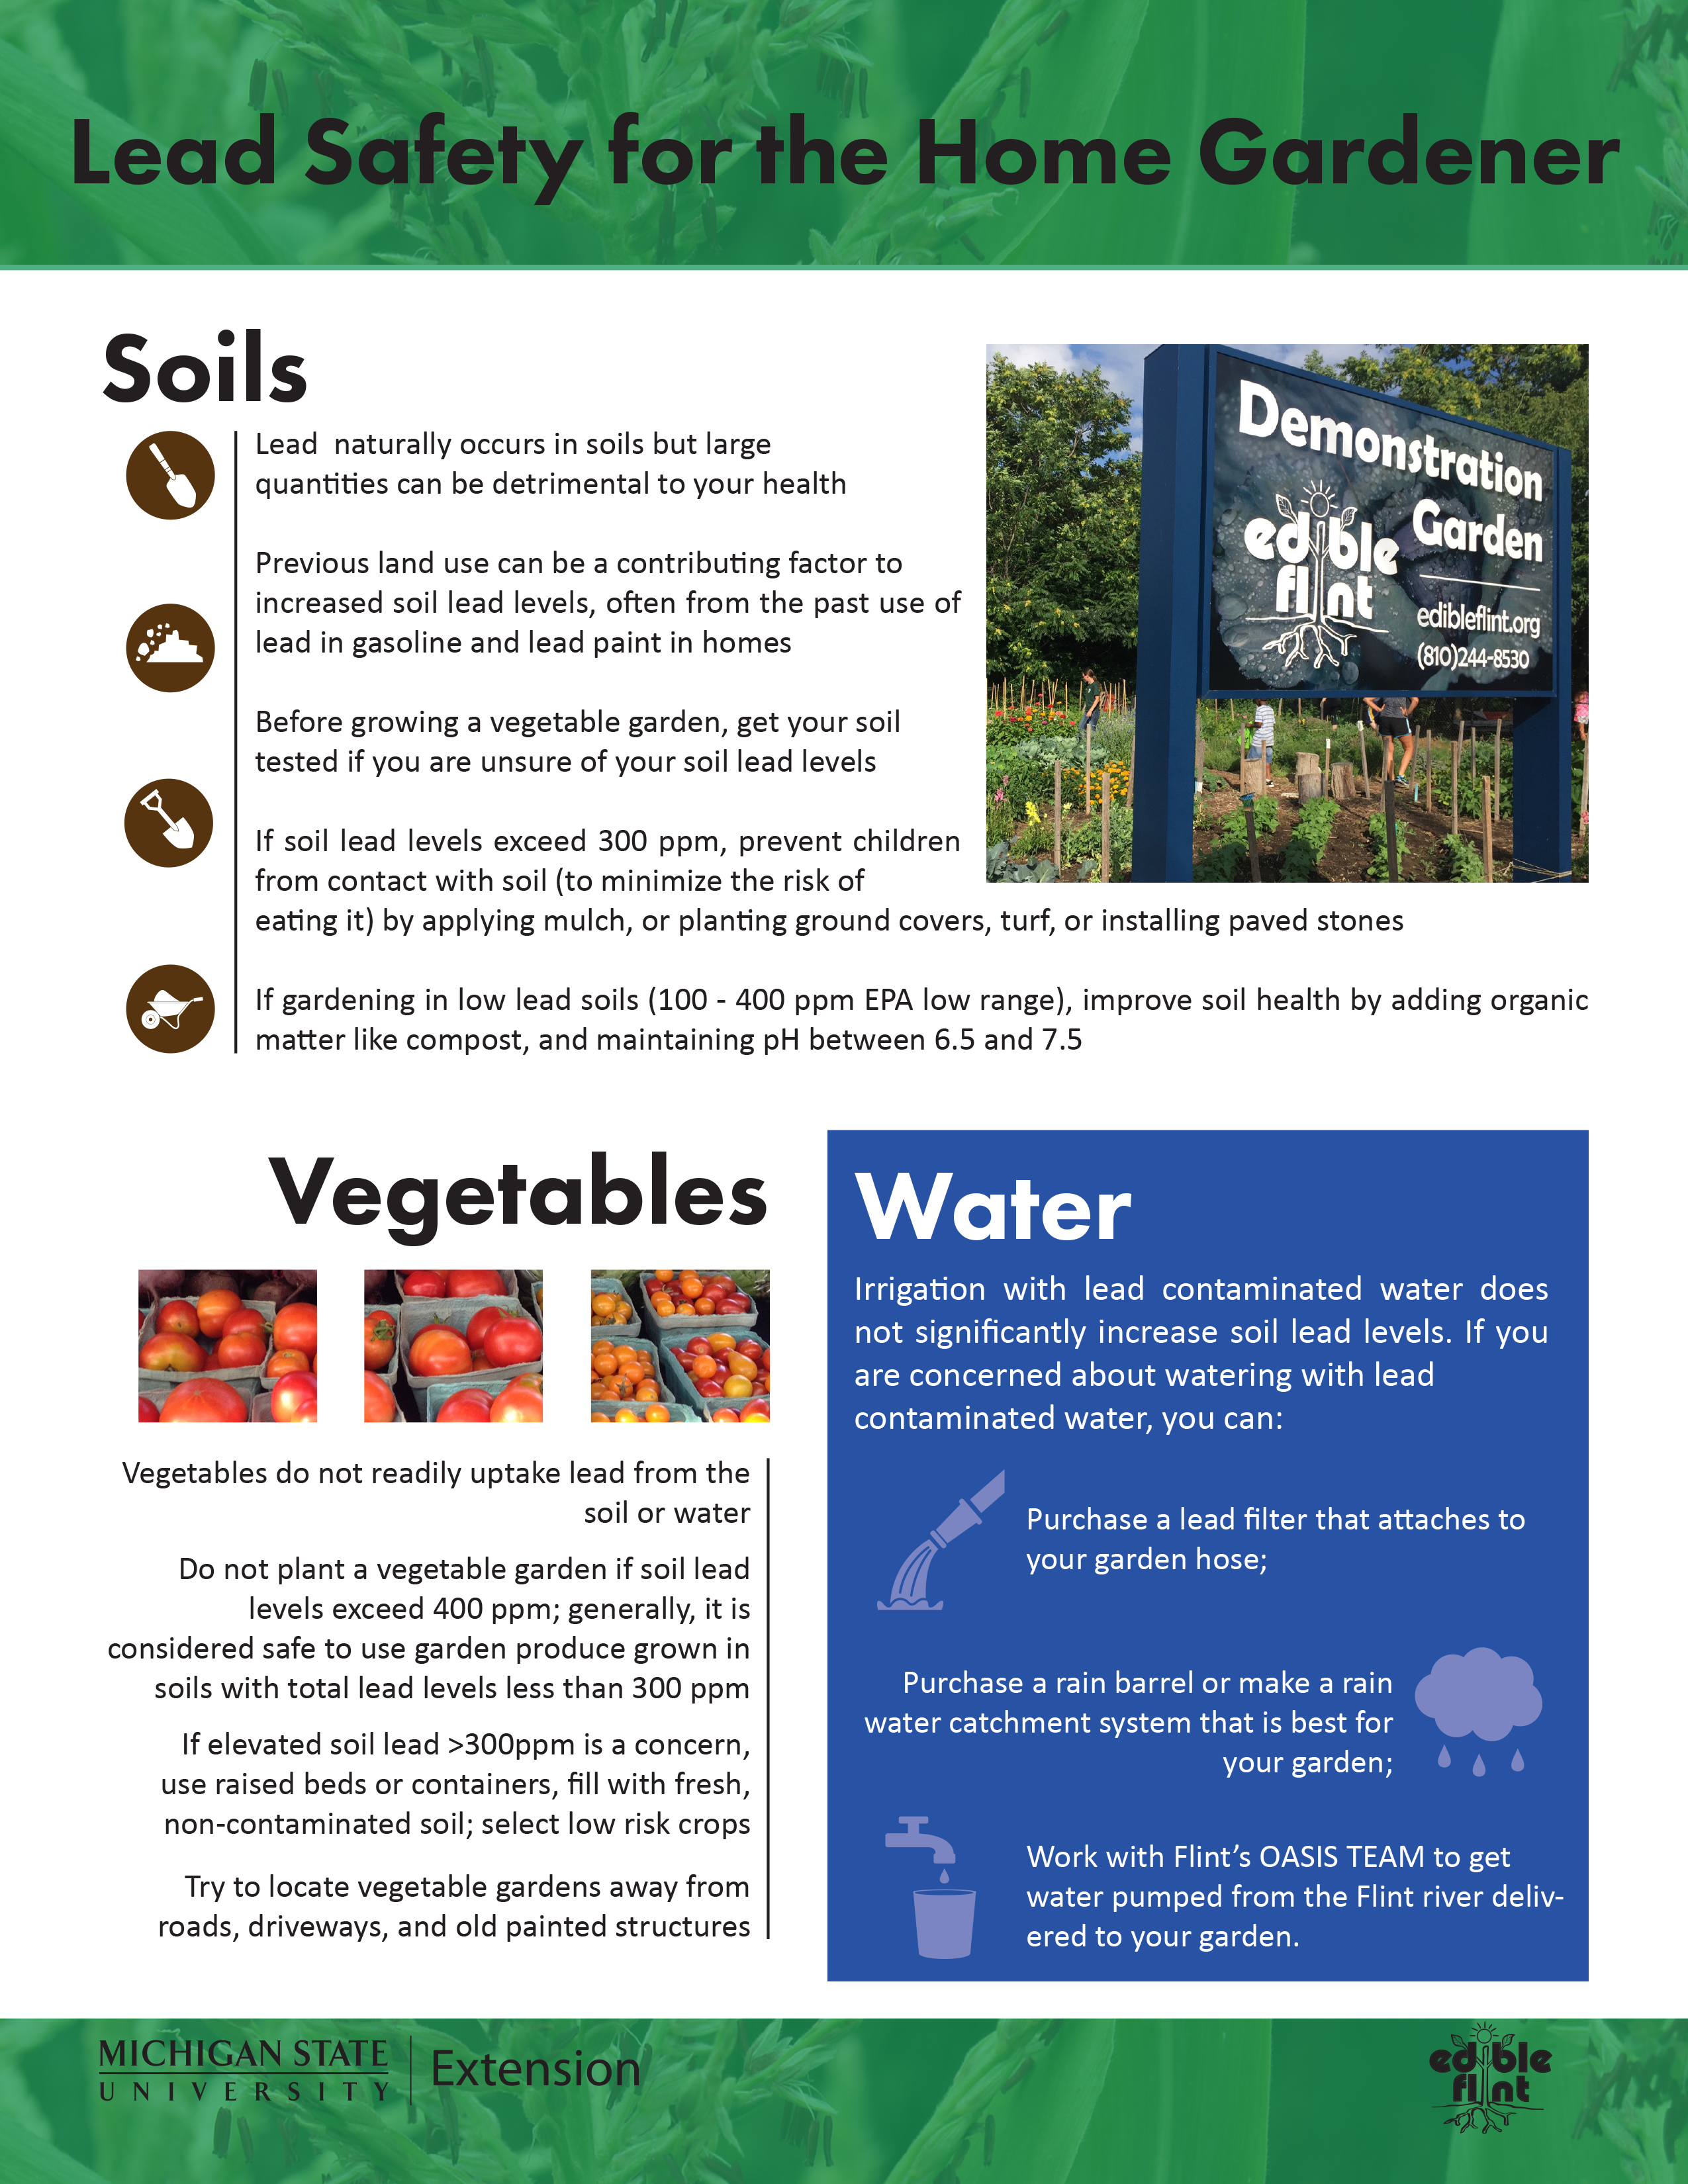 Lead-Safe Gardening